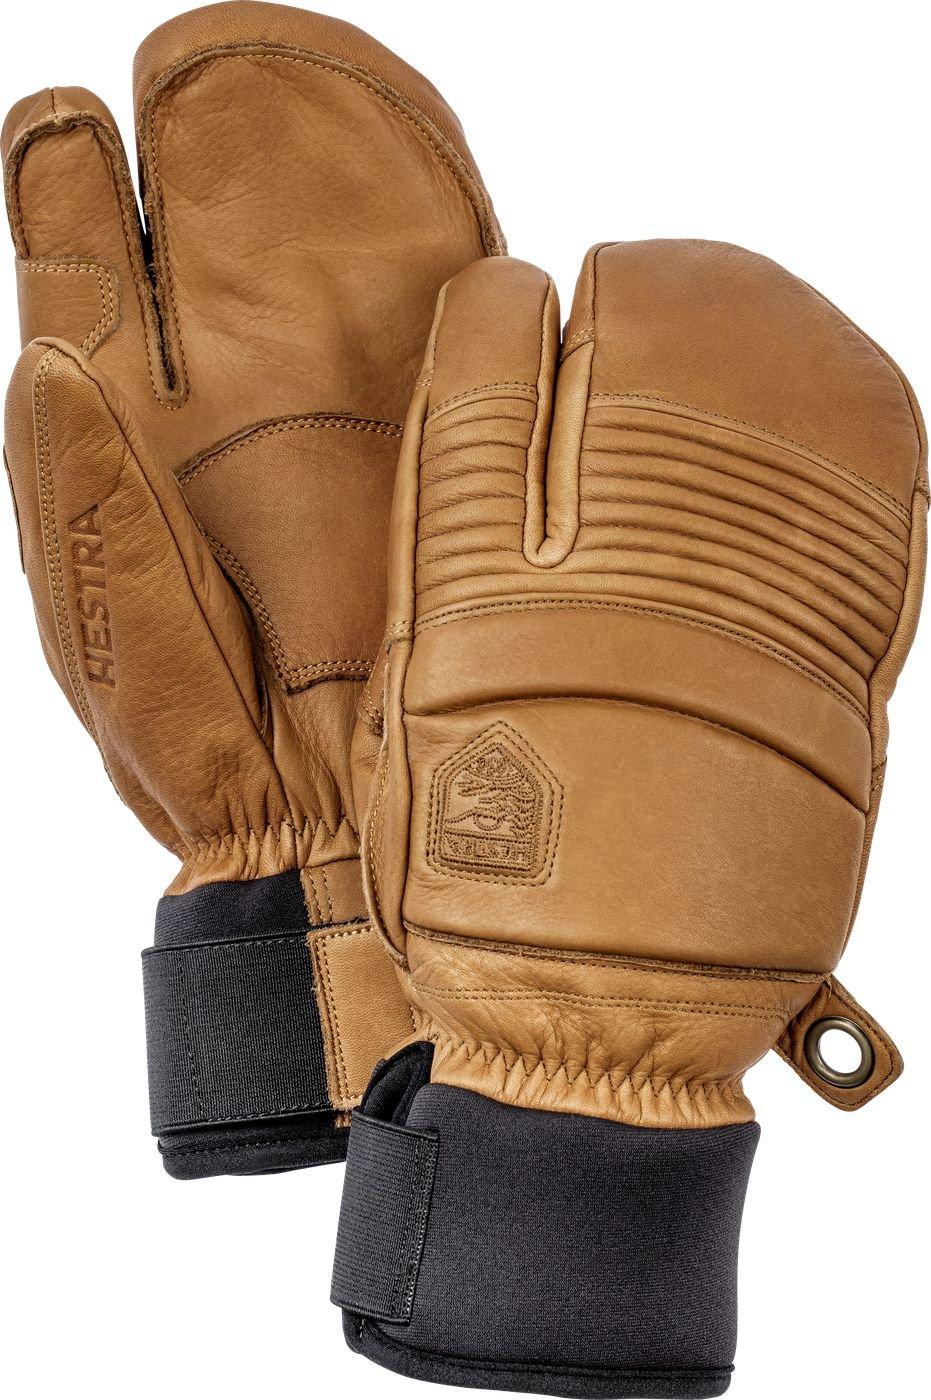 Hestra Hestra Mens Ski Gloves: Fall Line Winter Cold Weather Leather 3-finger Mittens 31472-860830-07